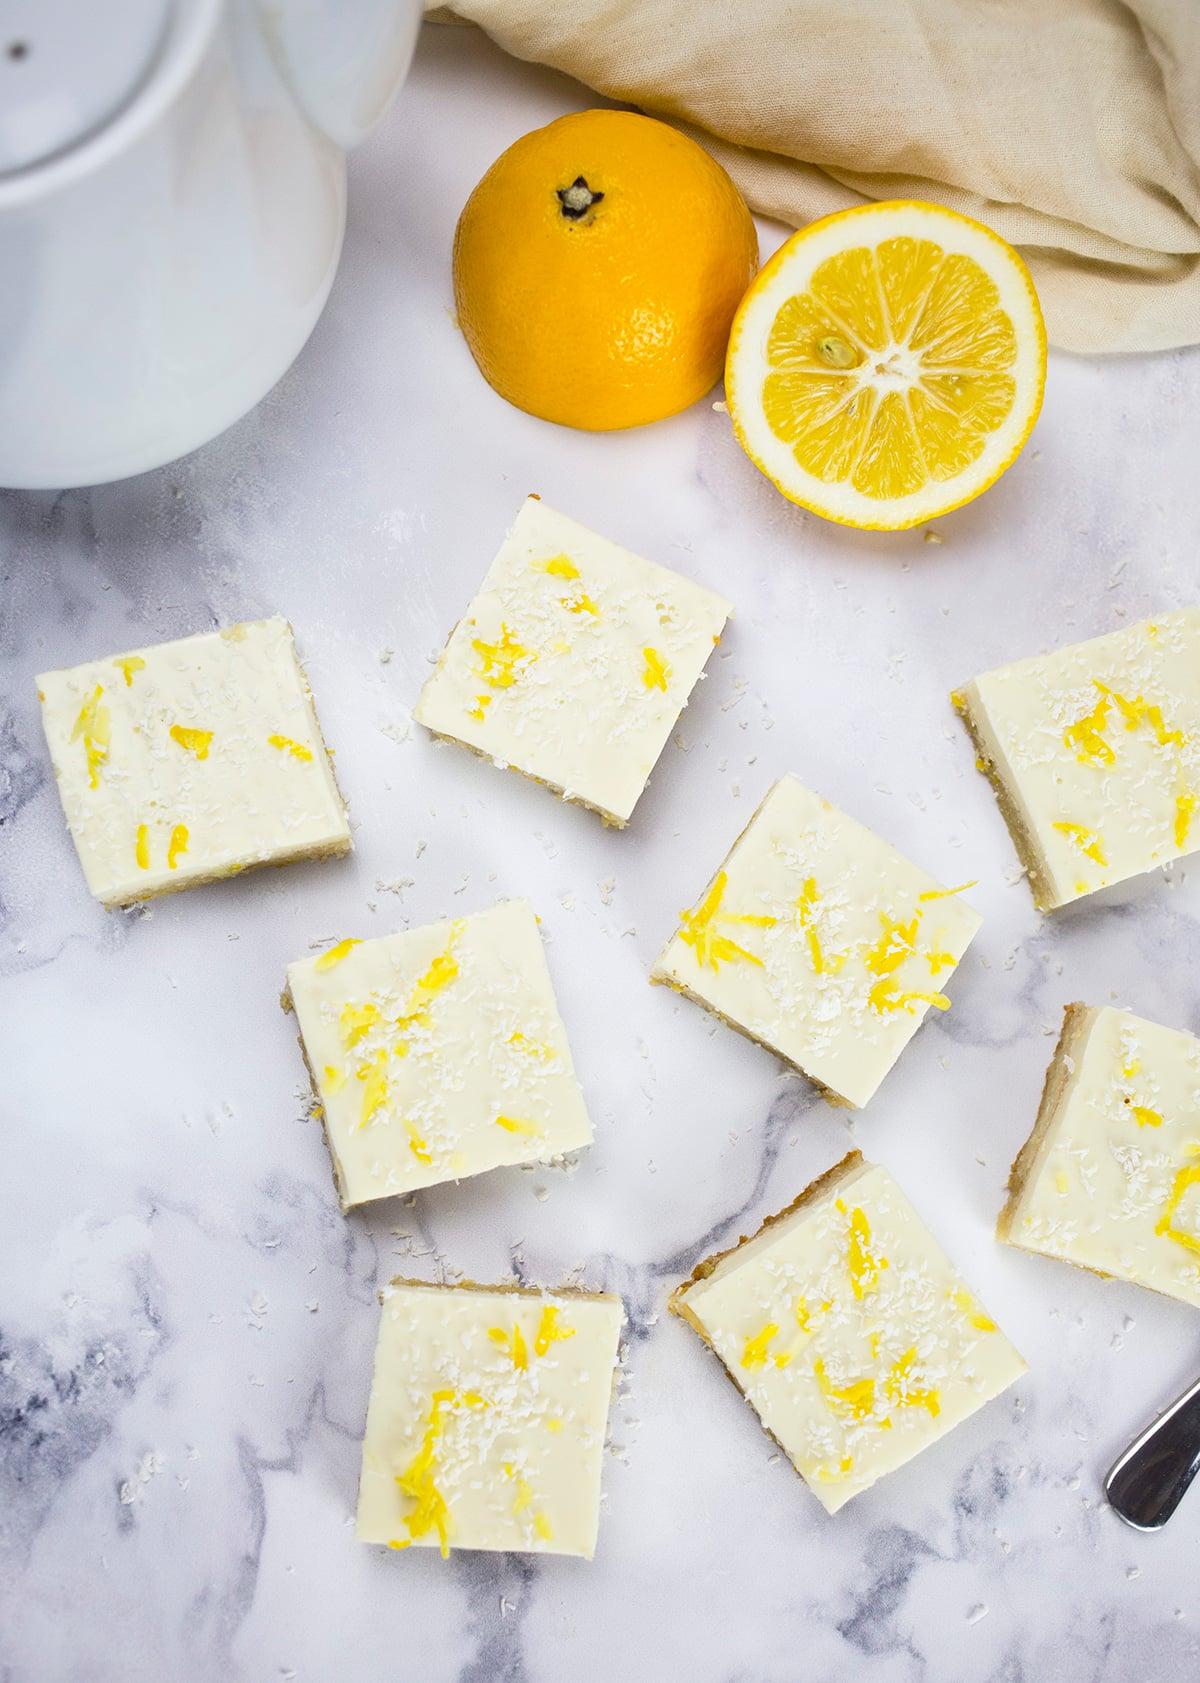 Birdseye view of lemon squares on marble background.